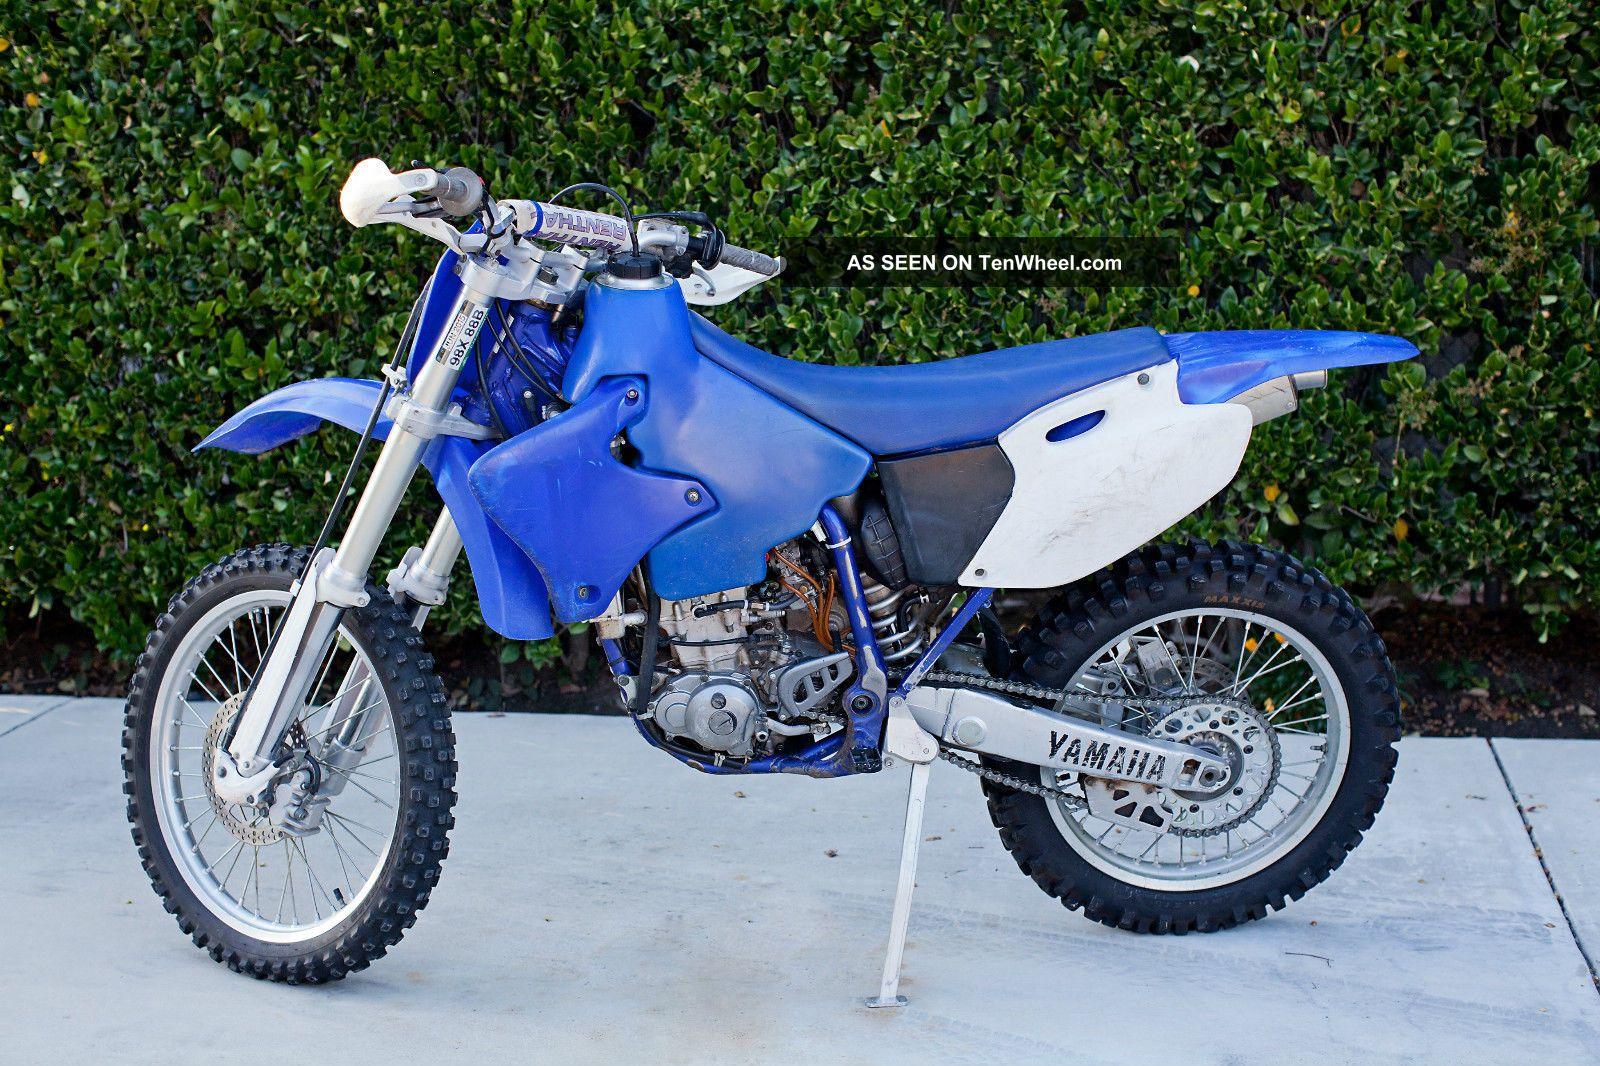 2000 yamaha yz426f dirtbike for Yamaha yz 426